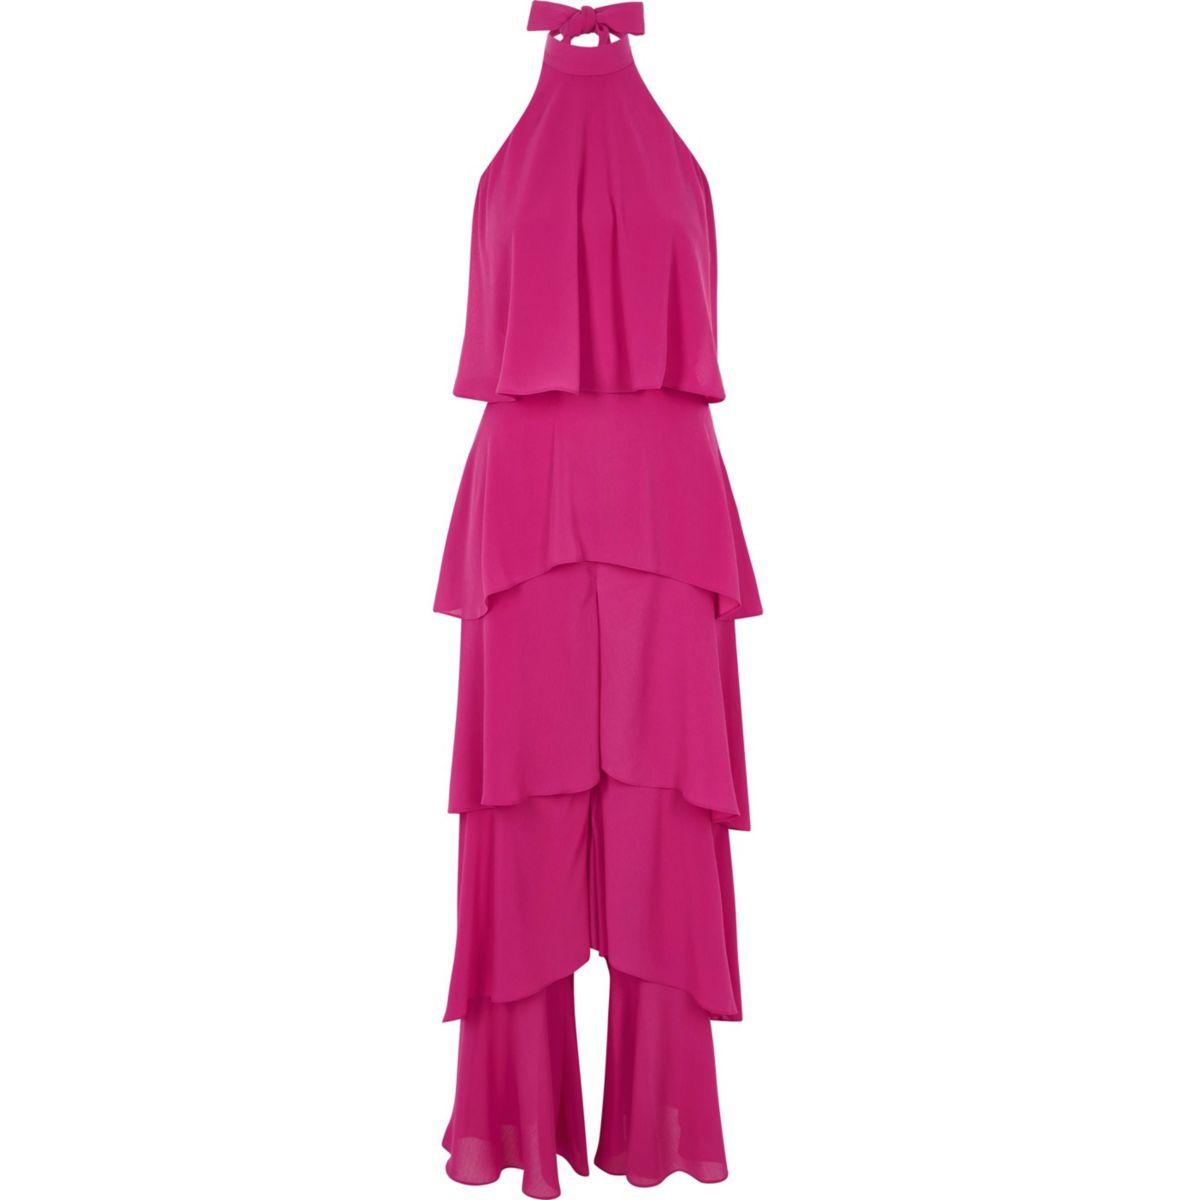 Bright pink wide leg halter frill jumpsuit